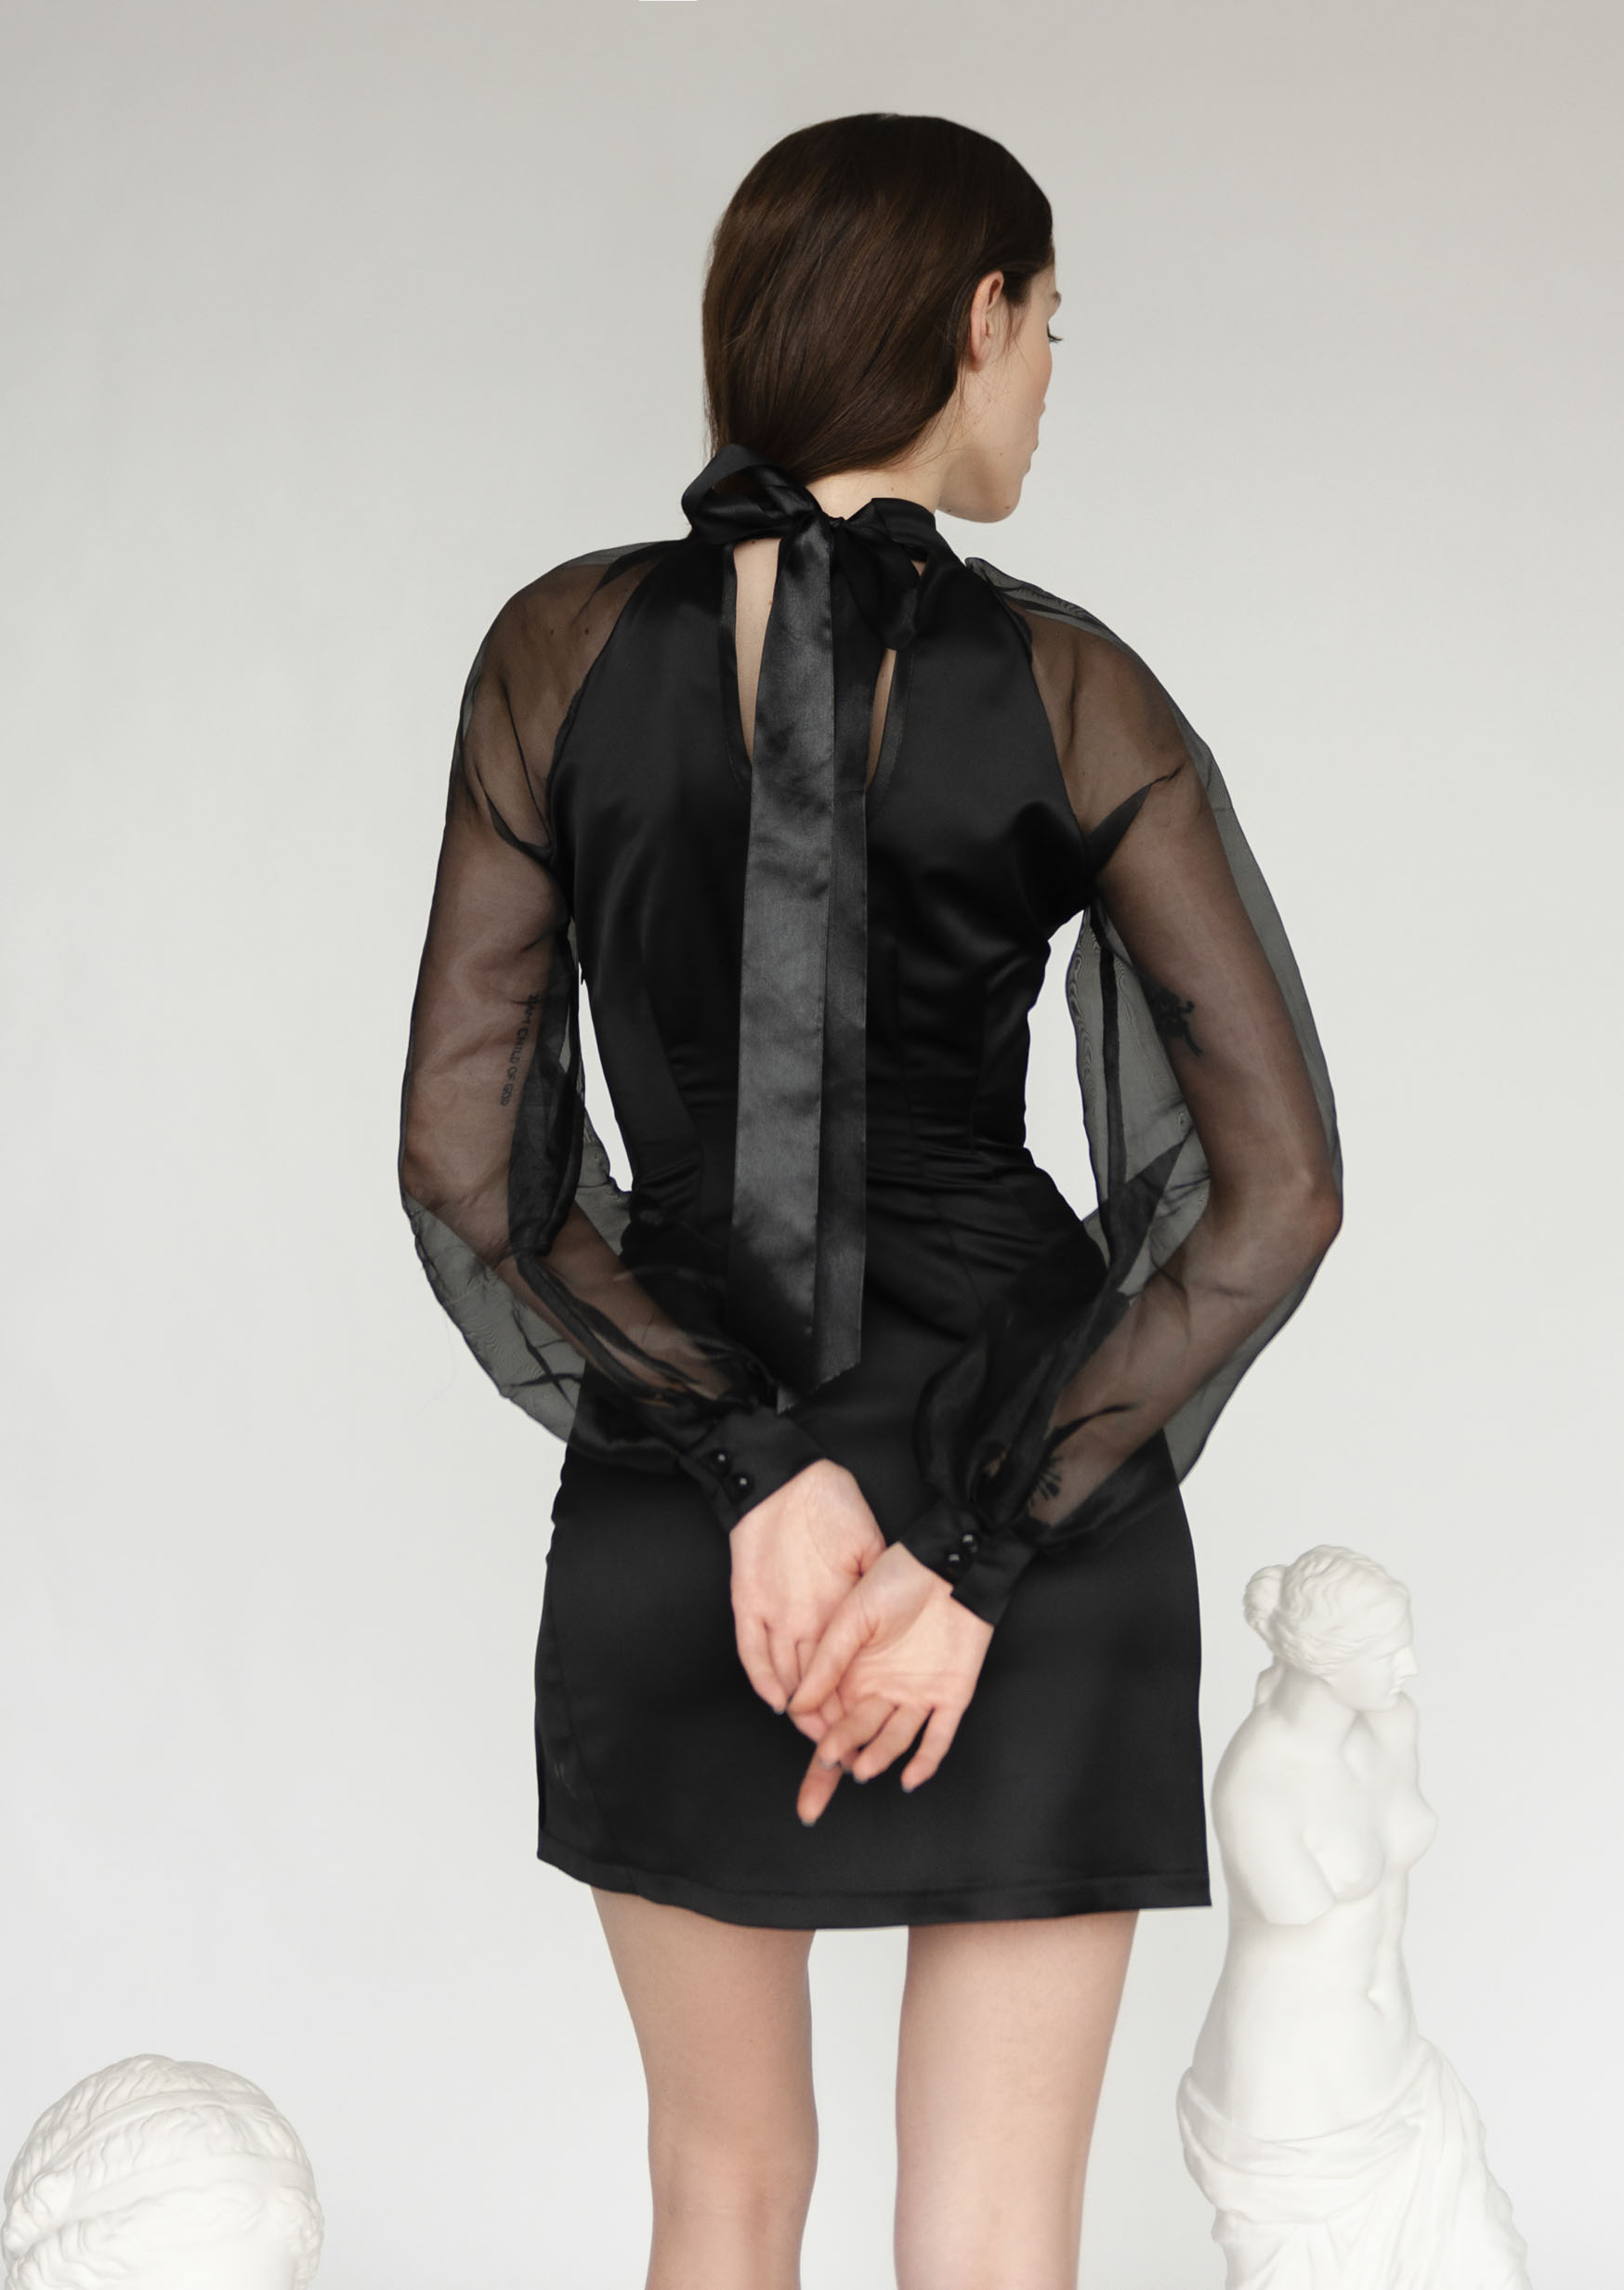 Black ink dress sheer vintage bodycon party bridesmaid dress